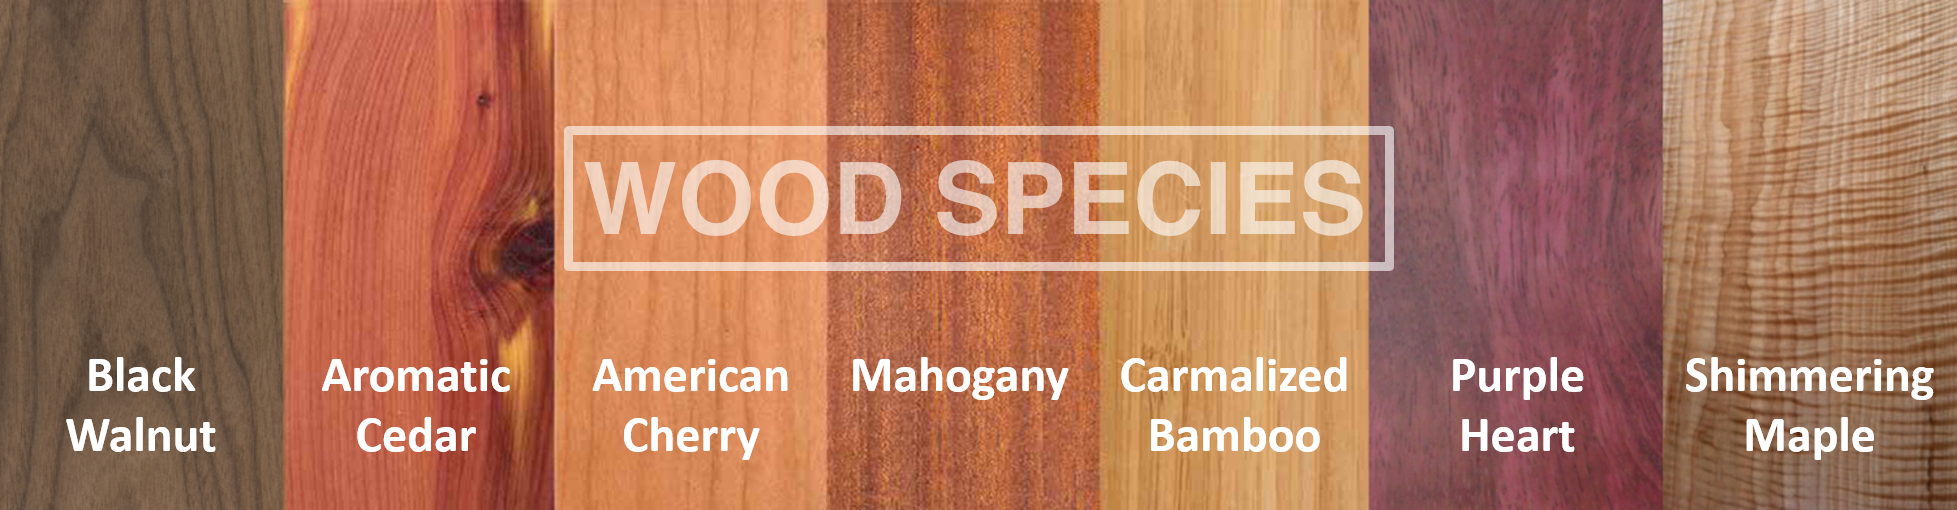 7 Beautiful Wood Species